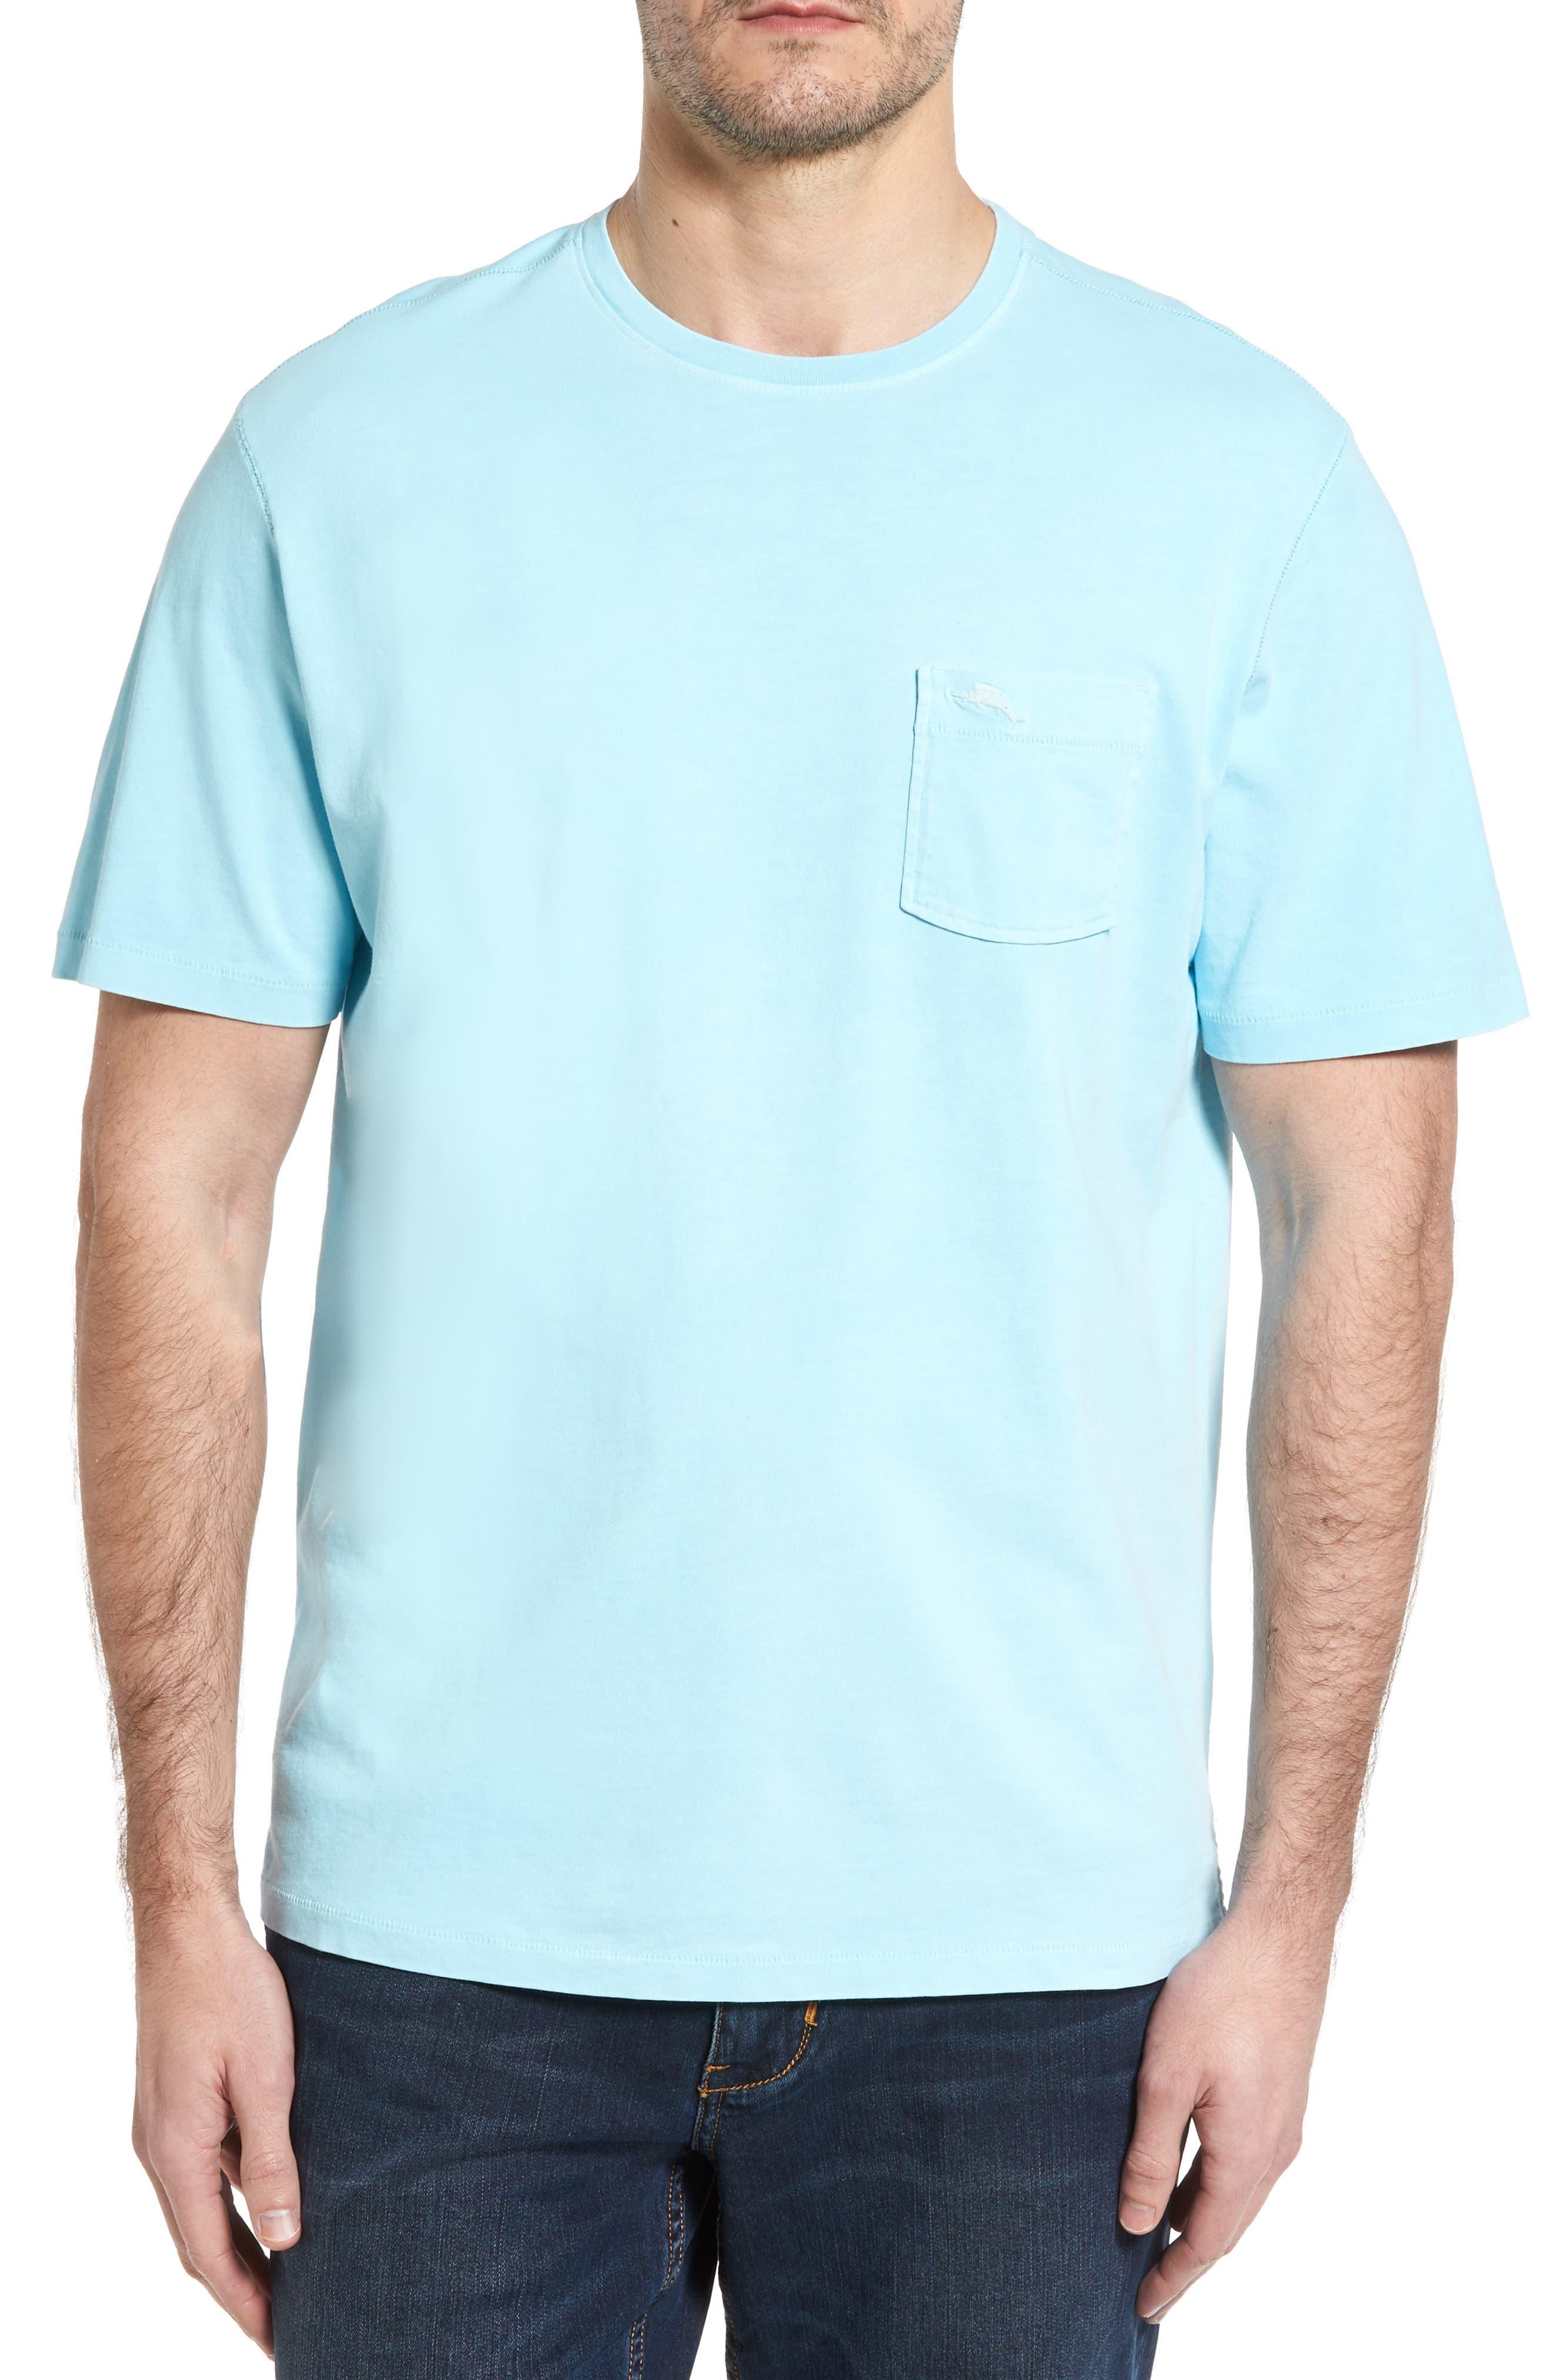 TOMMY BAHAMA New Bahama Reef Island Modern Fit Pima Cotton Pocket T-Shirt